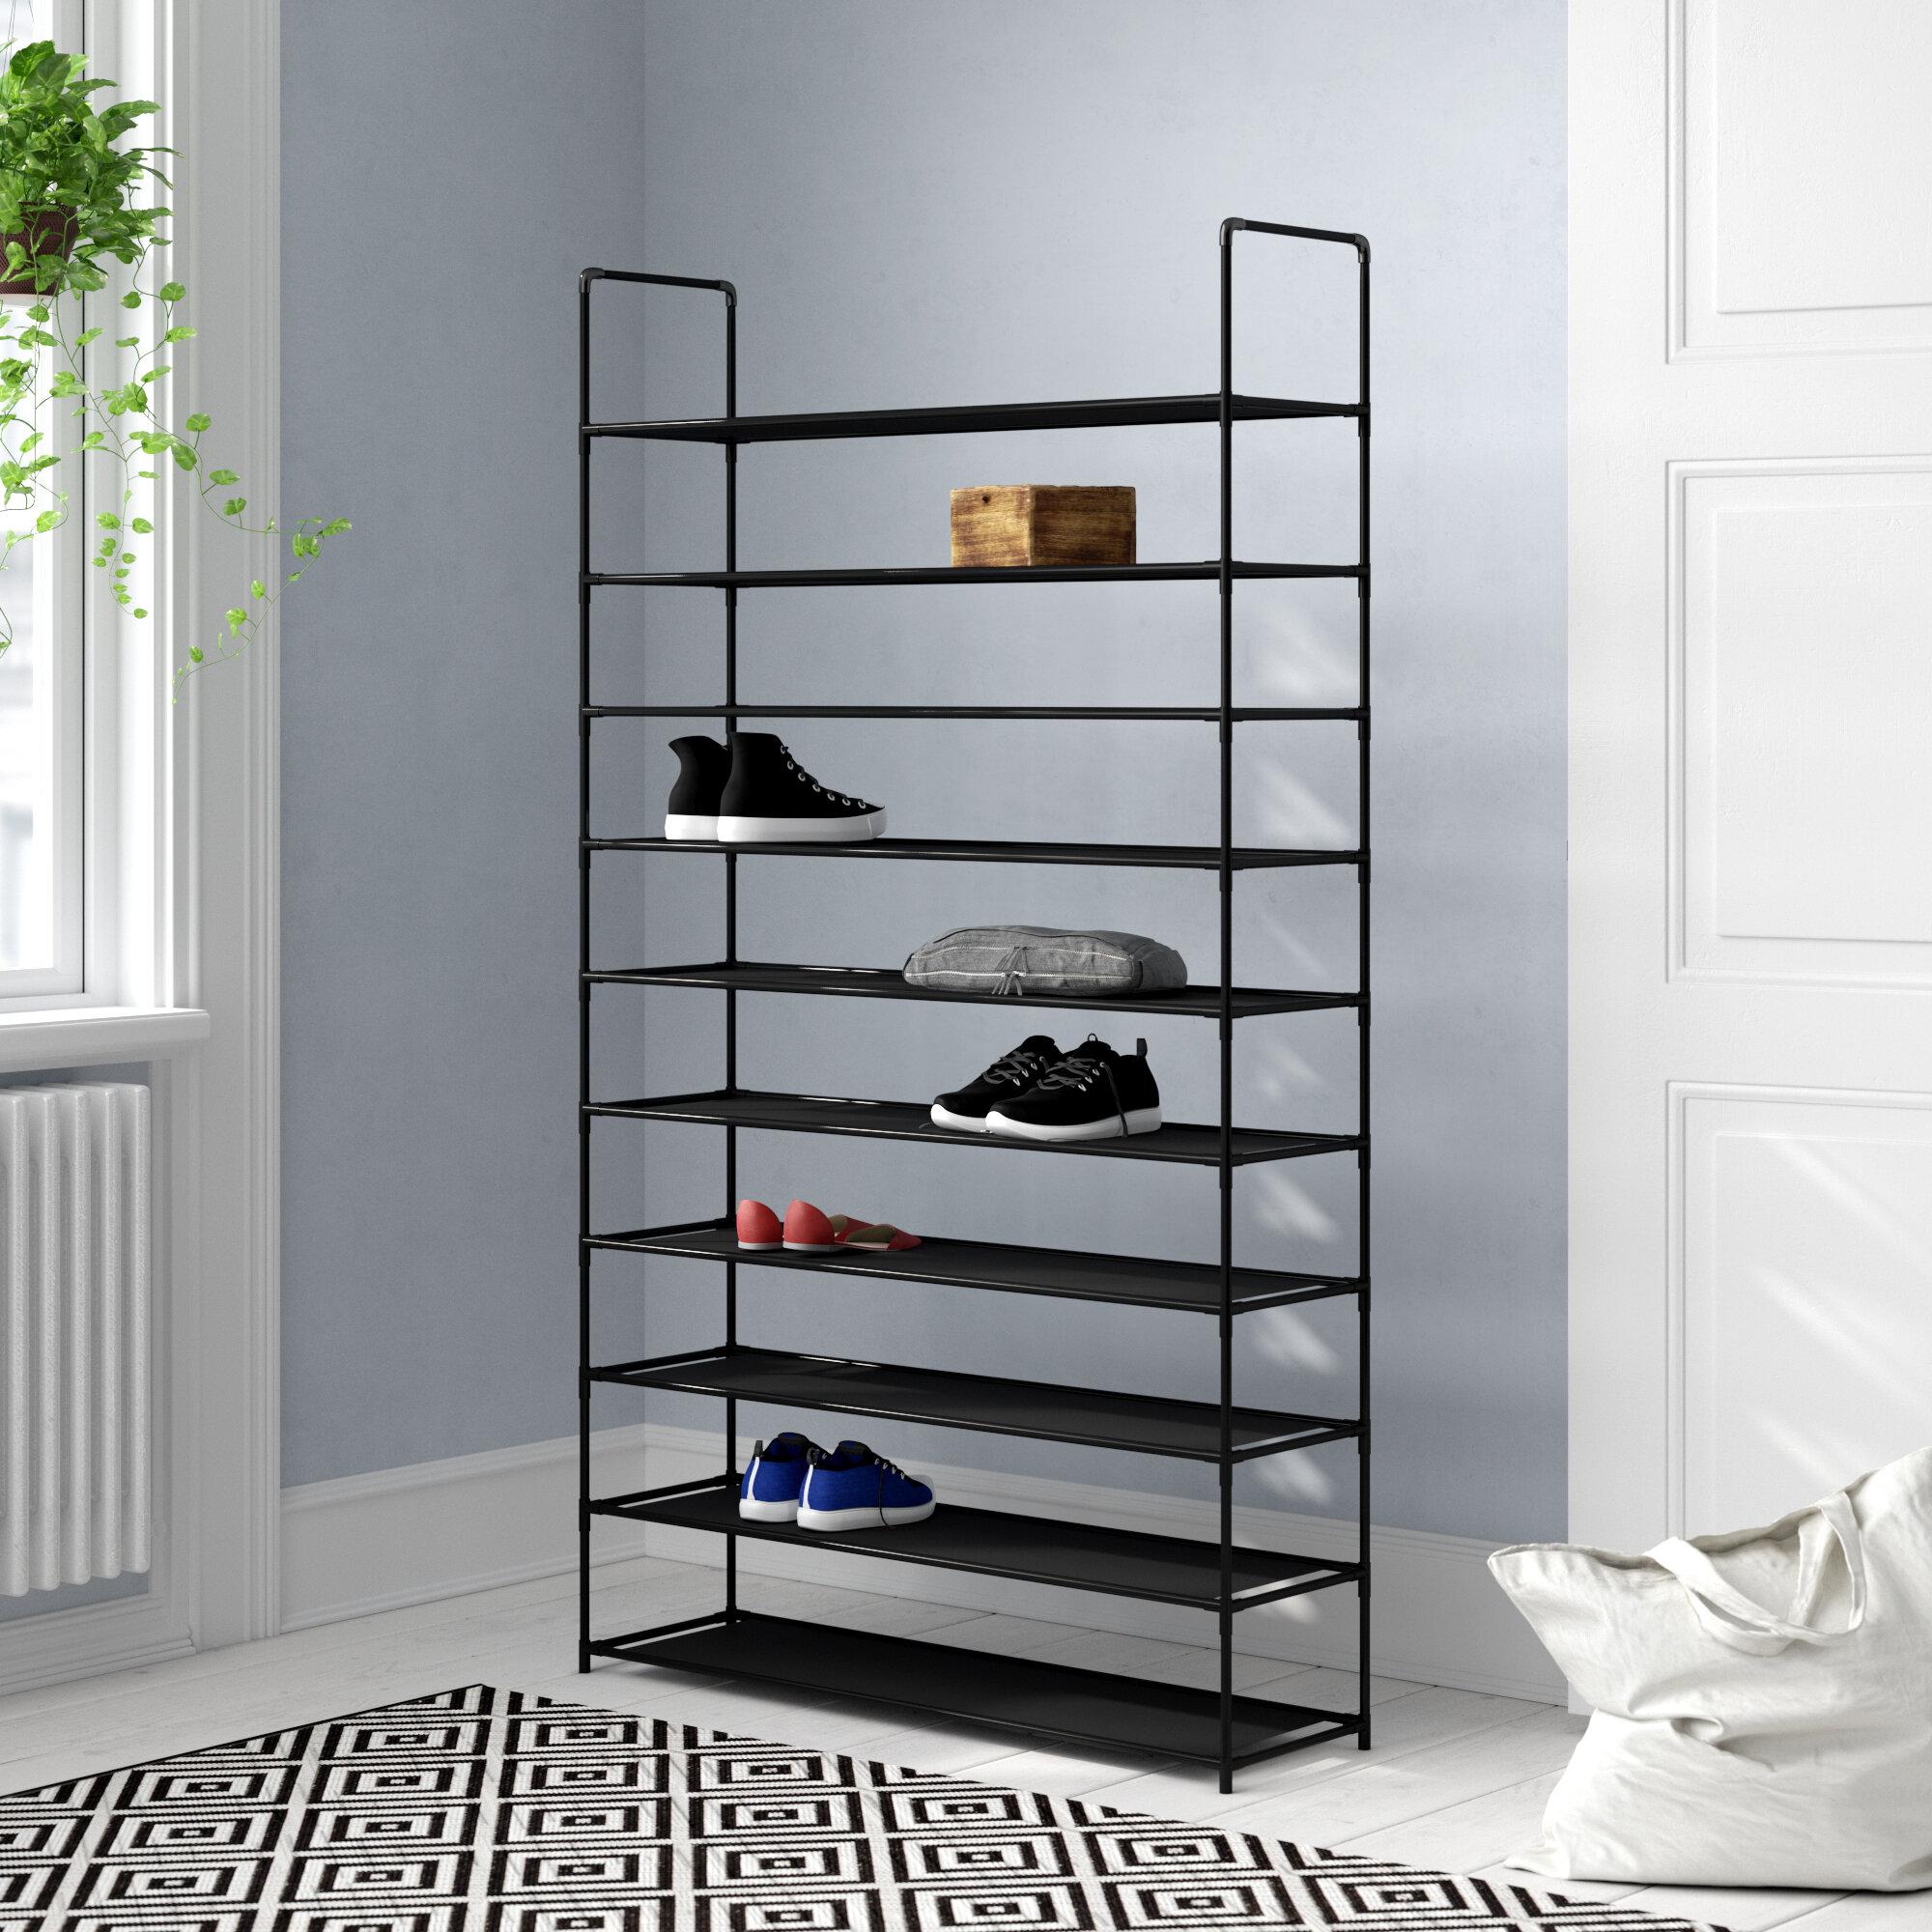 bettdecken platzsparend verstauen ikea schlafzimmer schwarz wei feng shui spiegel wandfarbe. Black Bedroom Furniture Sets. Home Design Ideas